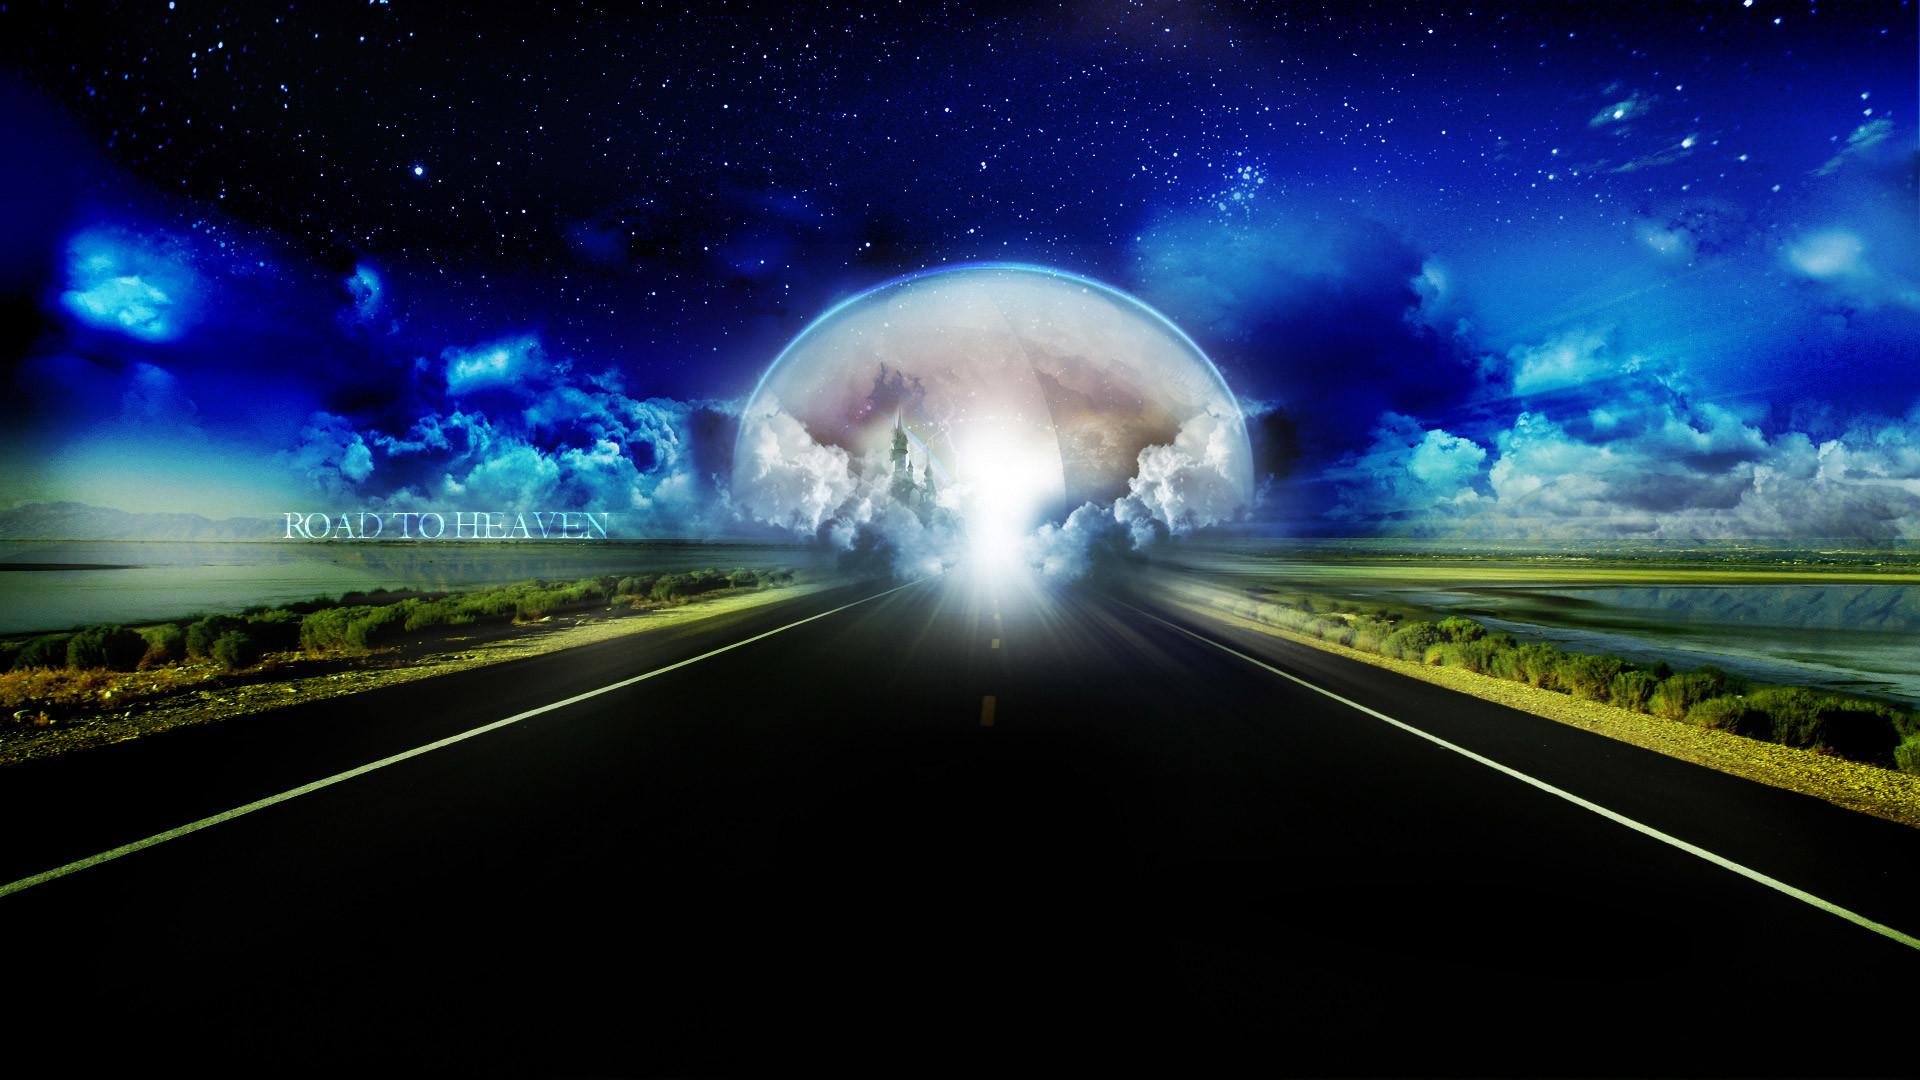 Road to Heaven WallPaper HD – https://imashon.com/w/